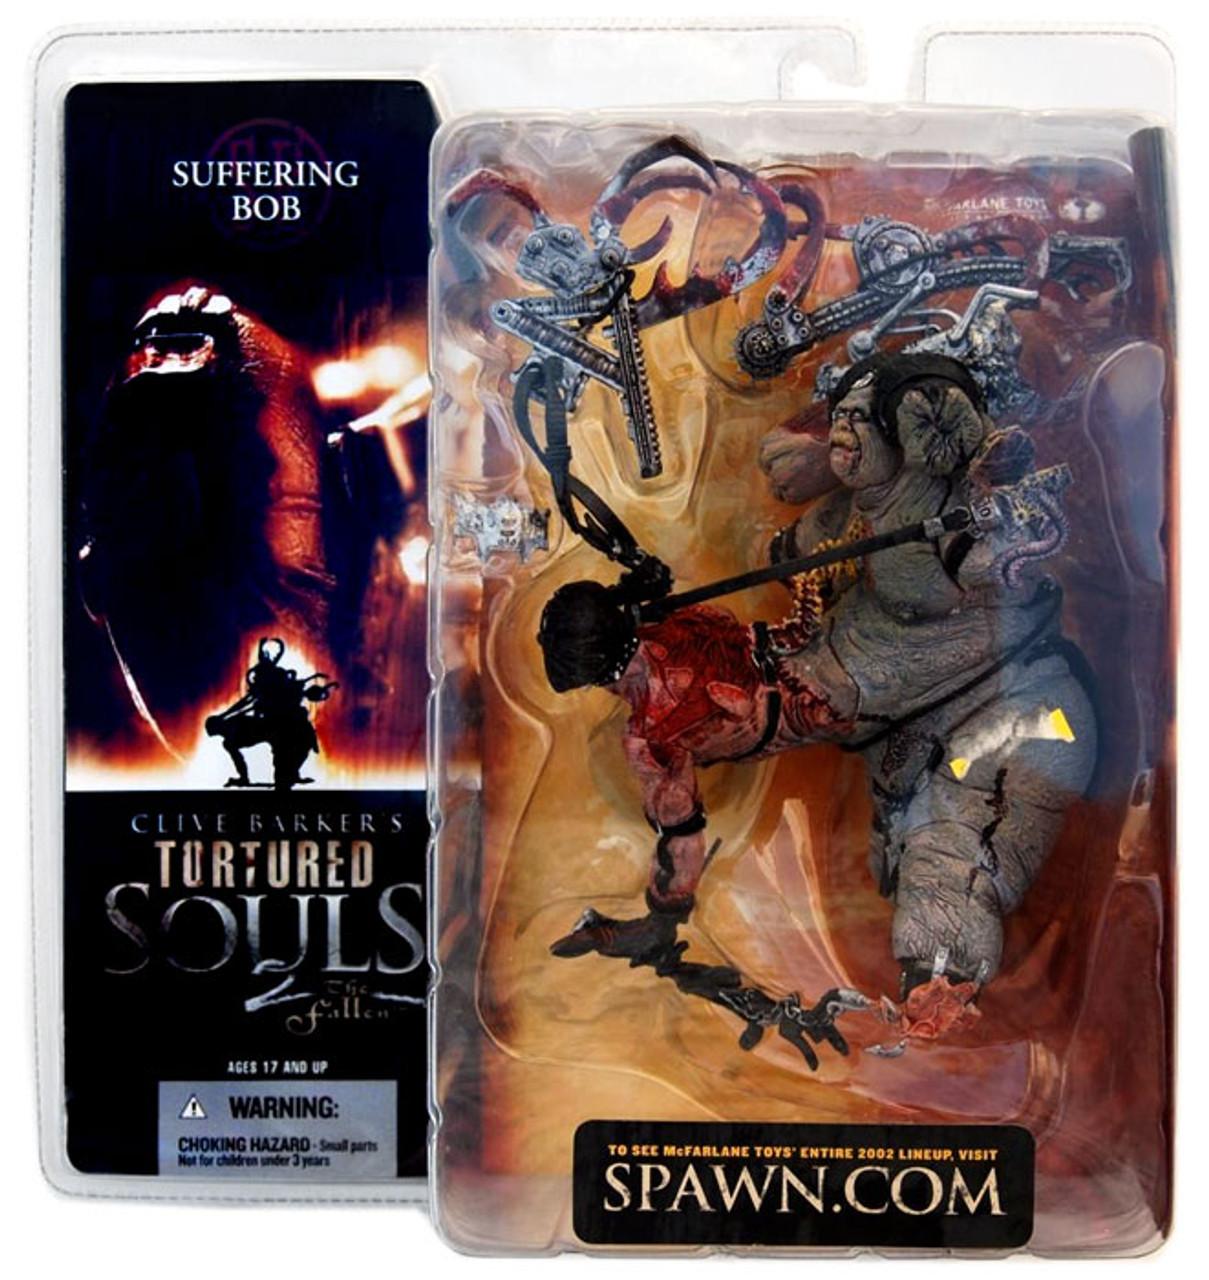 McFarlane Toys Clive Barker's Tortured Souls Tortured Souls 2 The Fallen Suffering Bob Action Figure